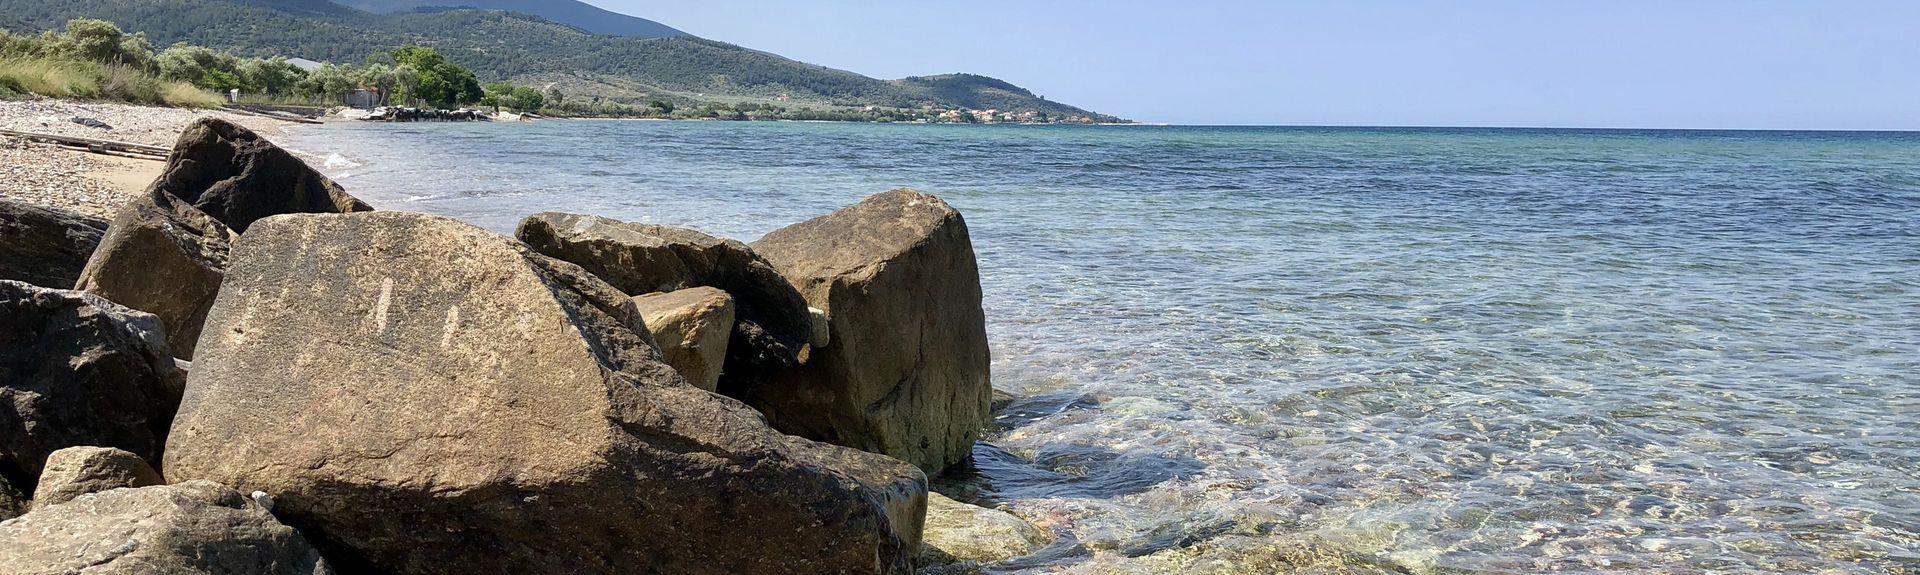 Makryammos Beach, Thasos, Eastern Macedonia and Thrace, Greece